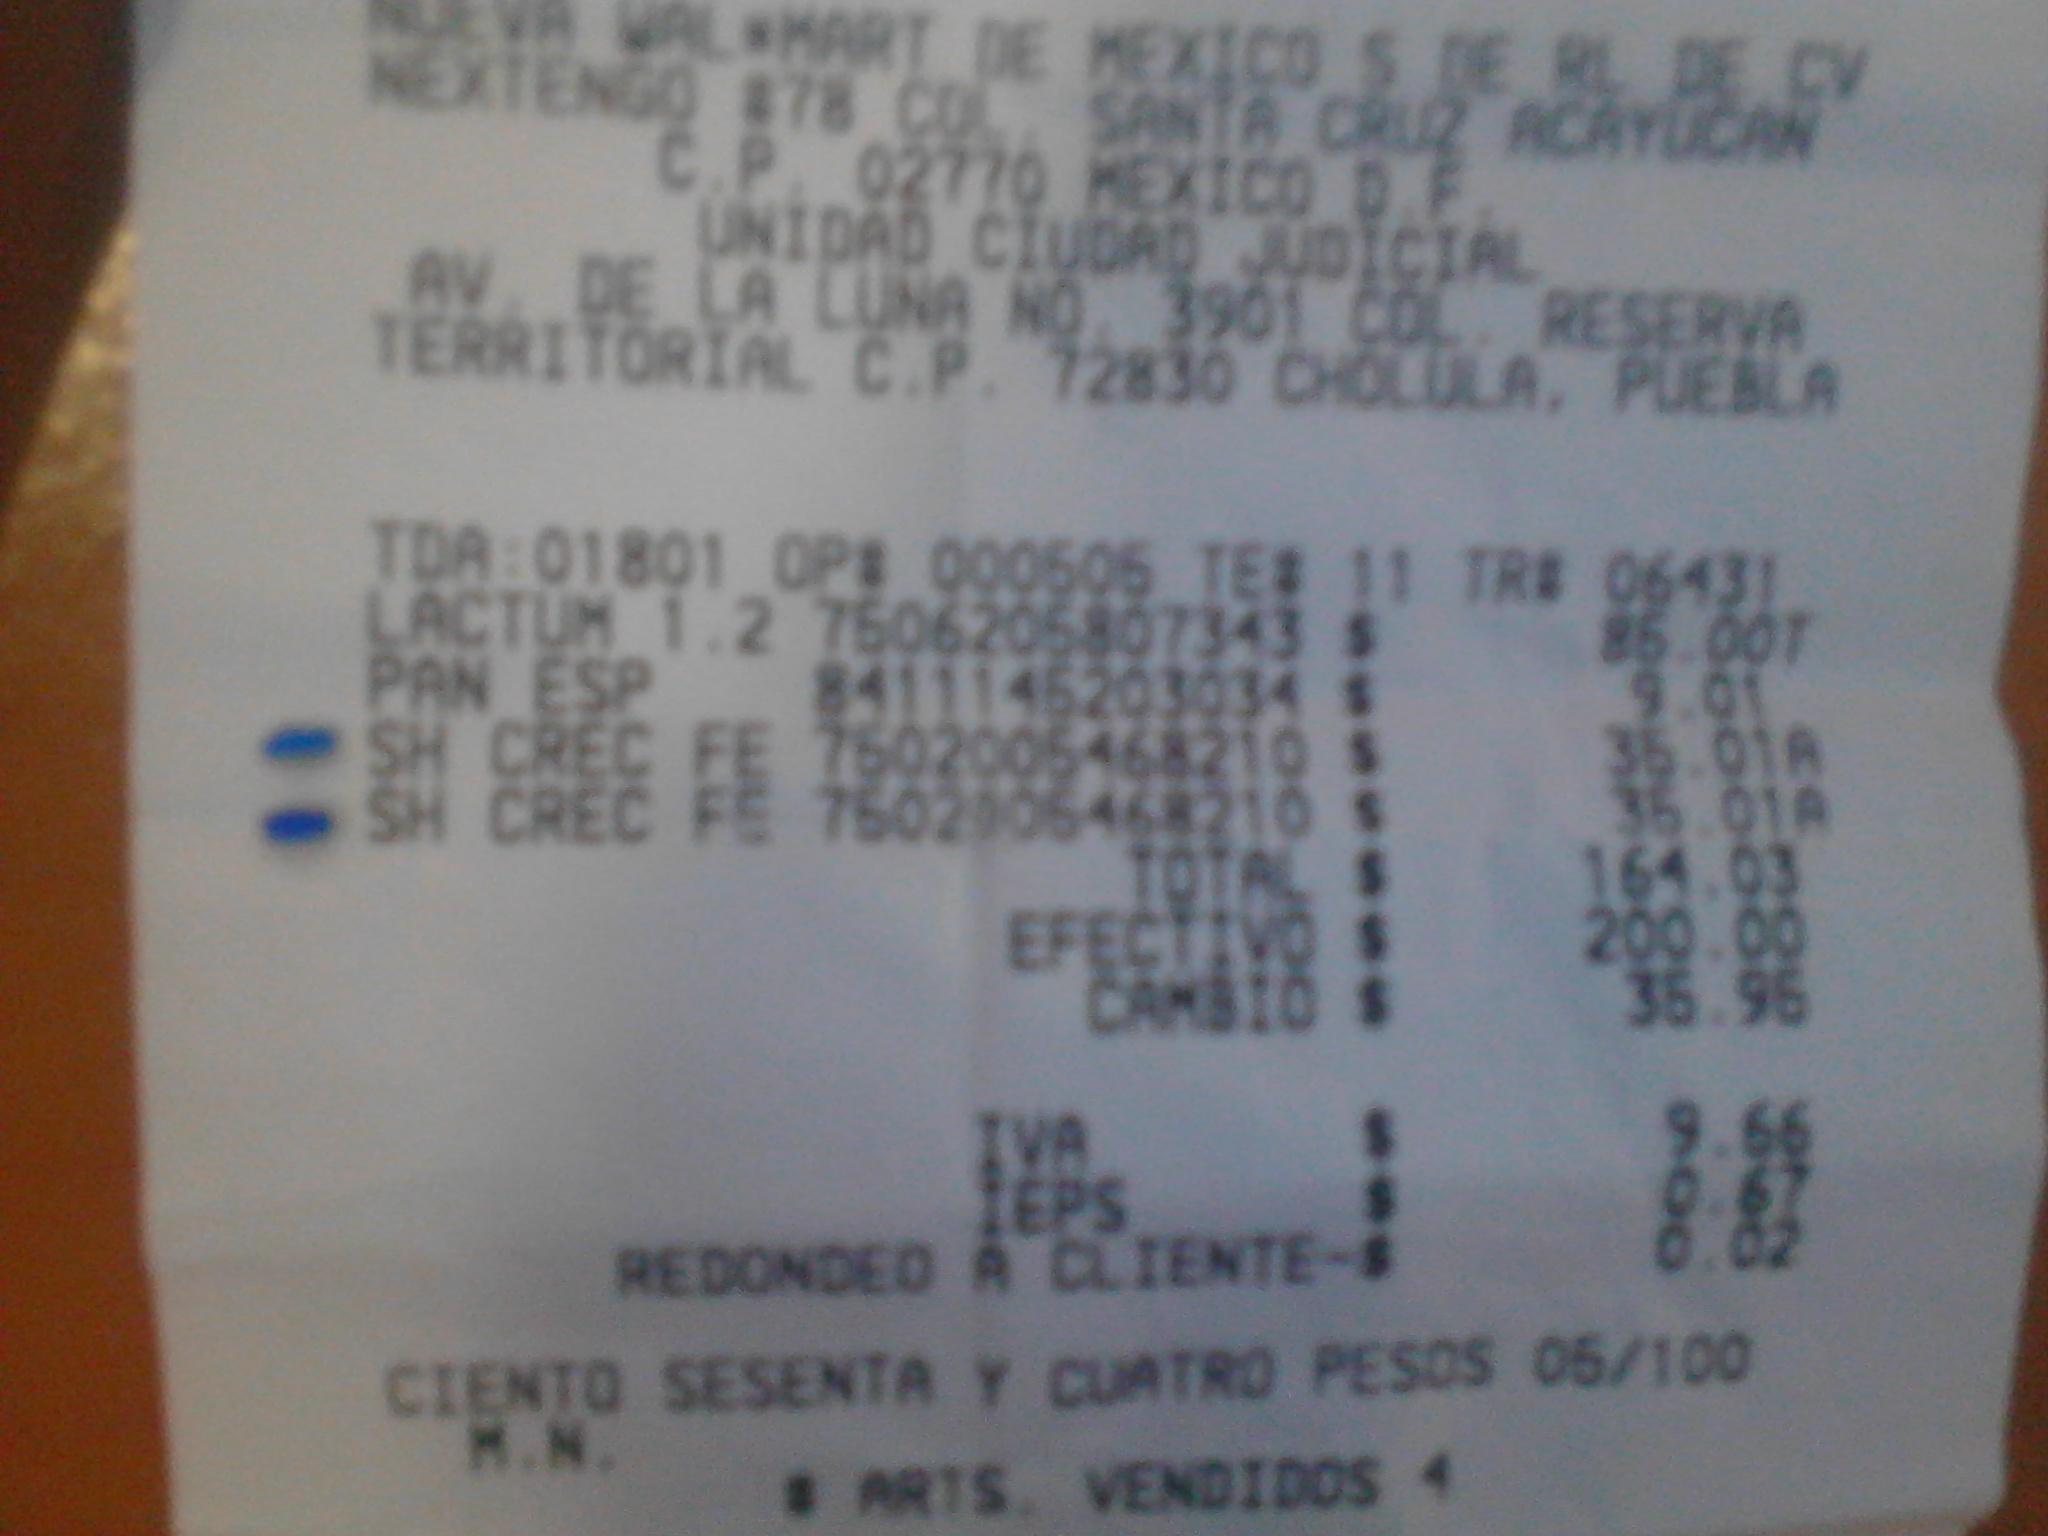 Walmart Ciudad Judical Puebla: Shampoo Cre-c Fem a $35.01